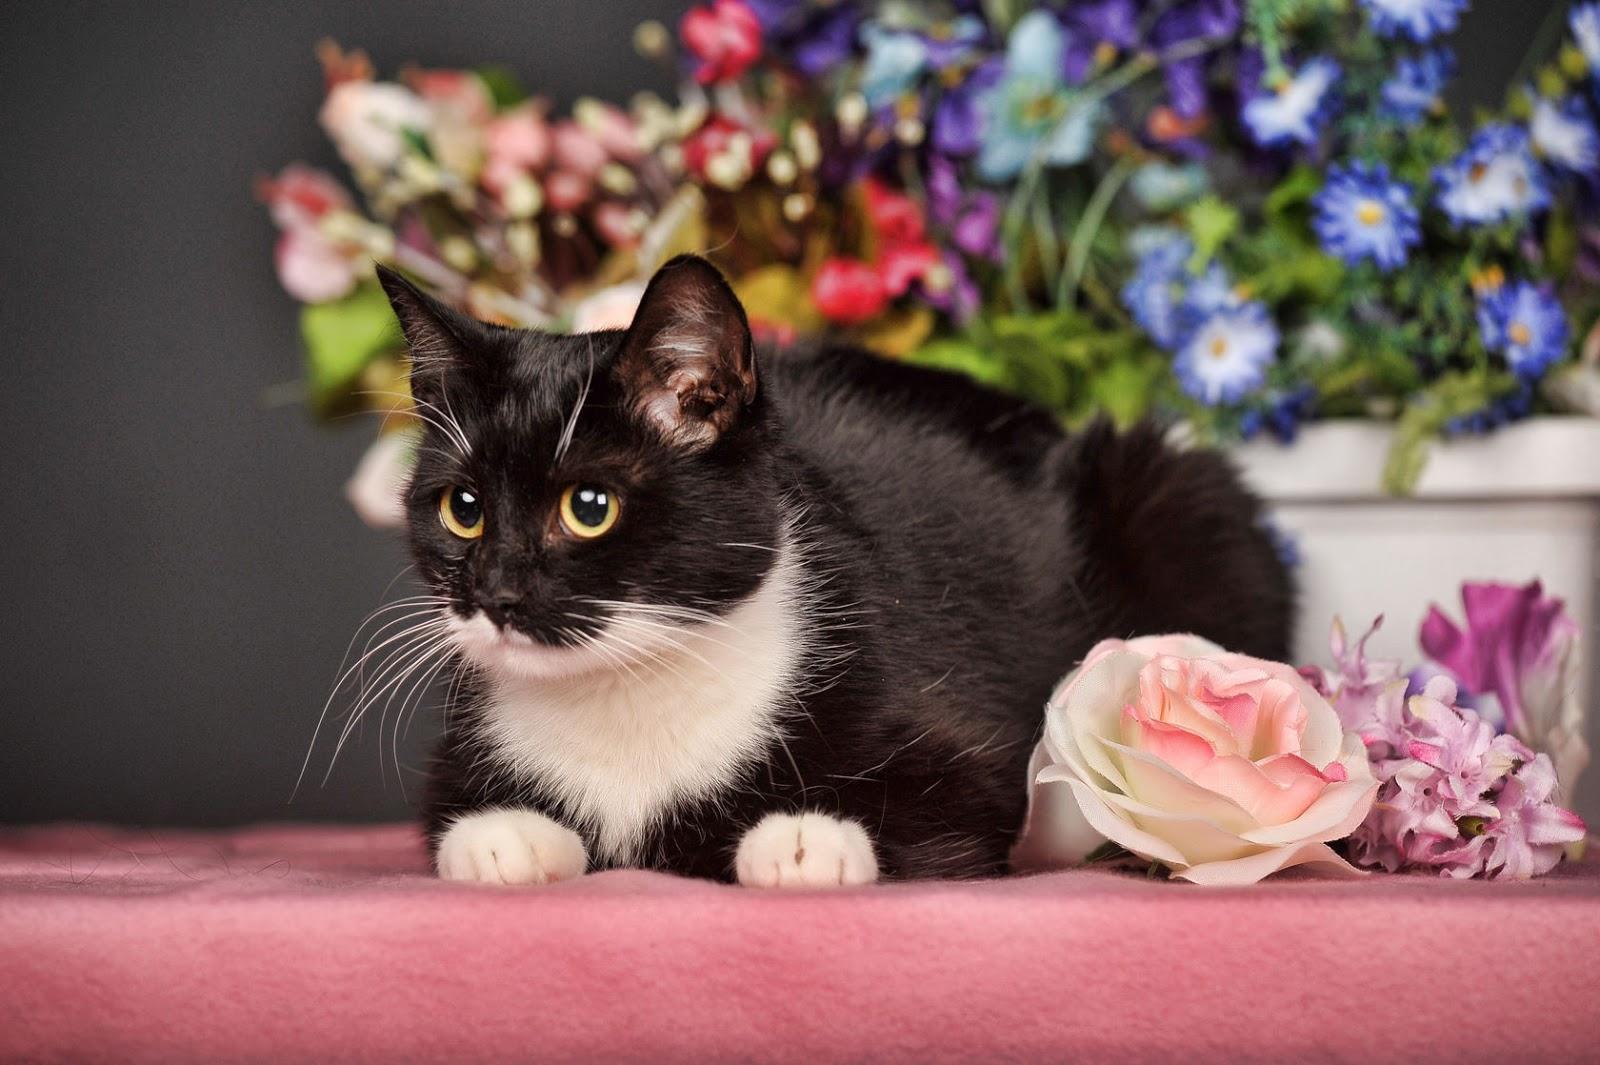 BANCO DE IMÁGENES: Gatito con flores - Cute little cat - Minino